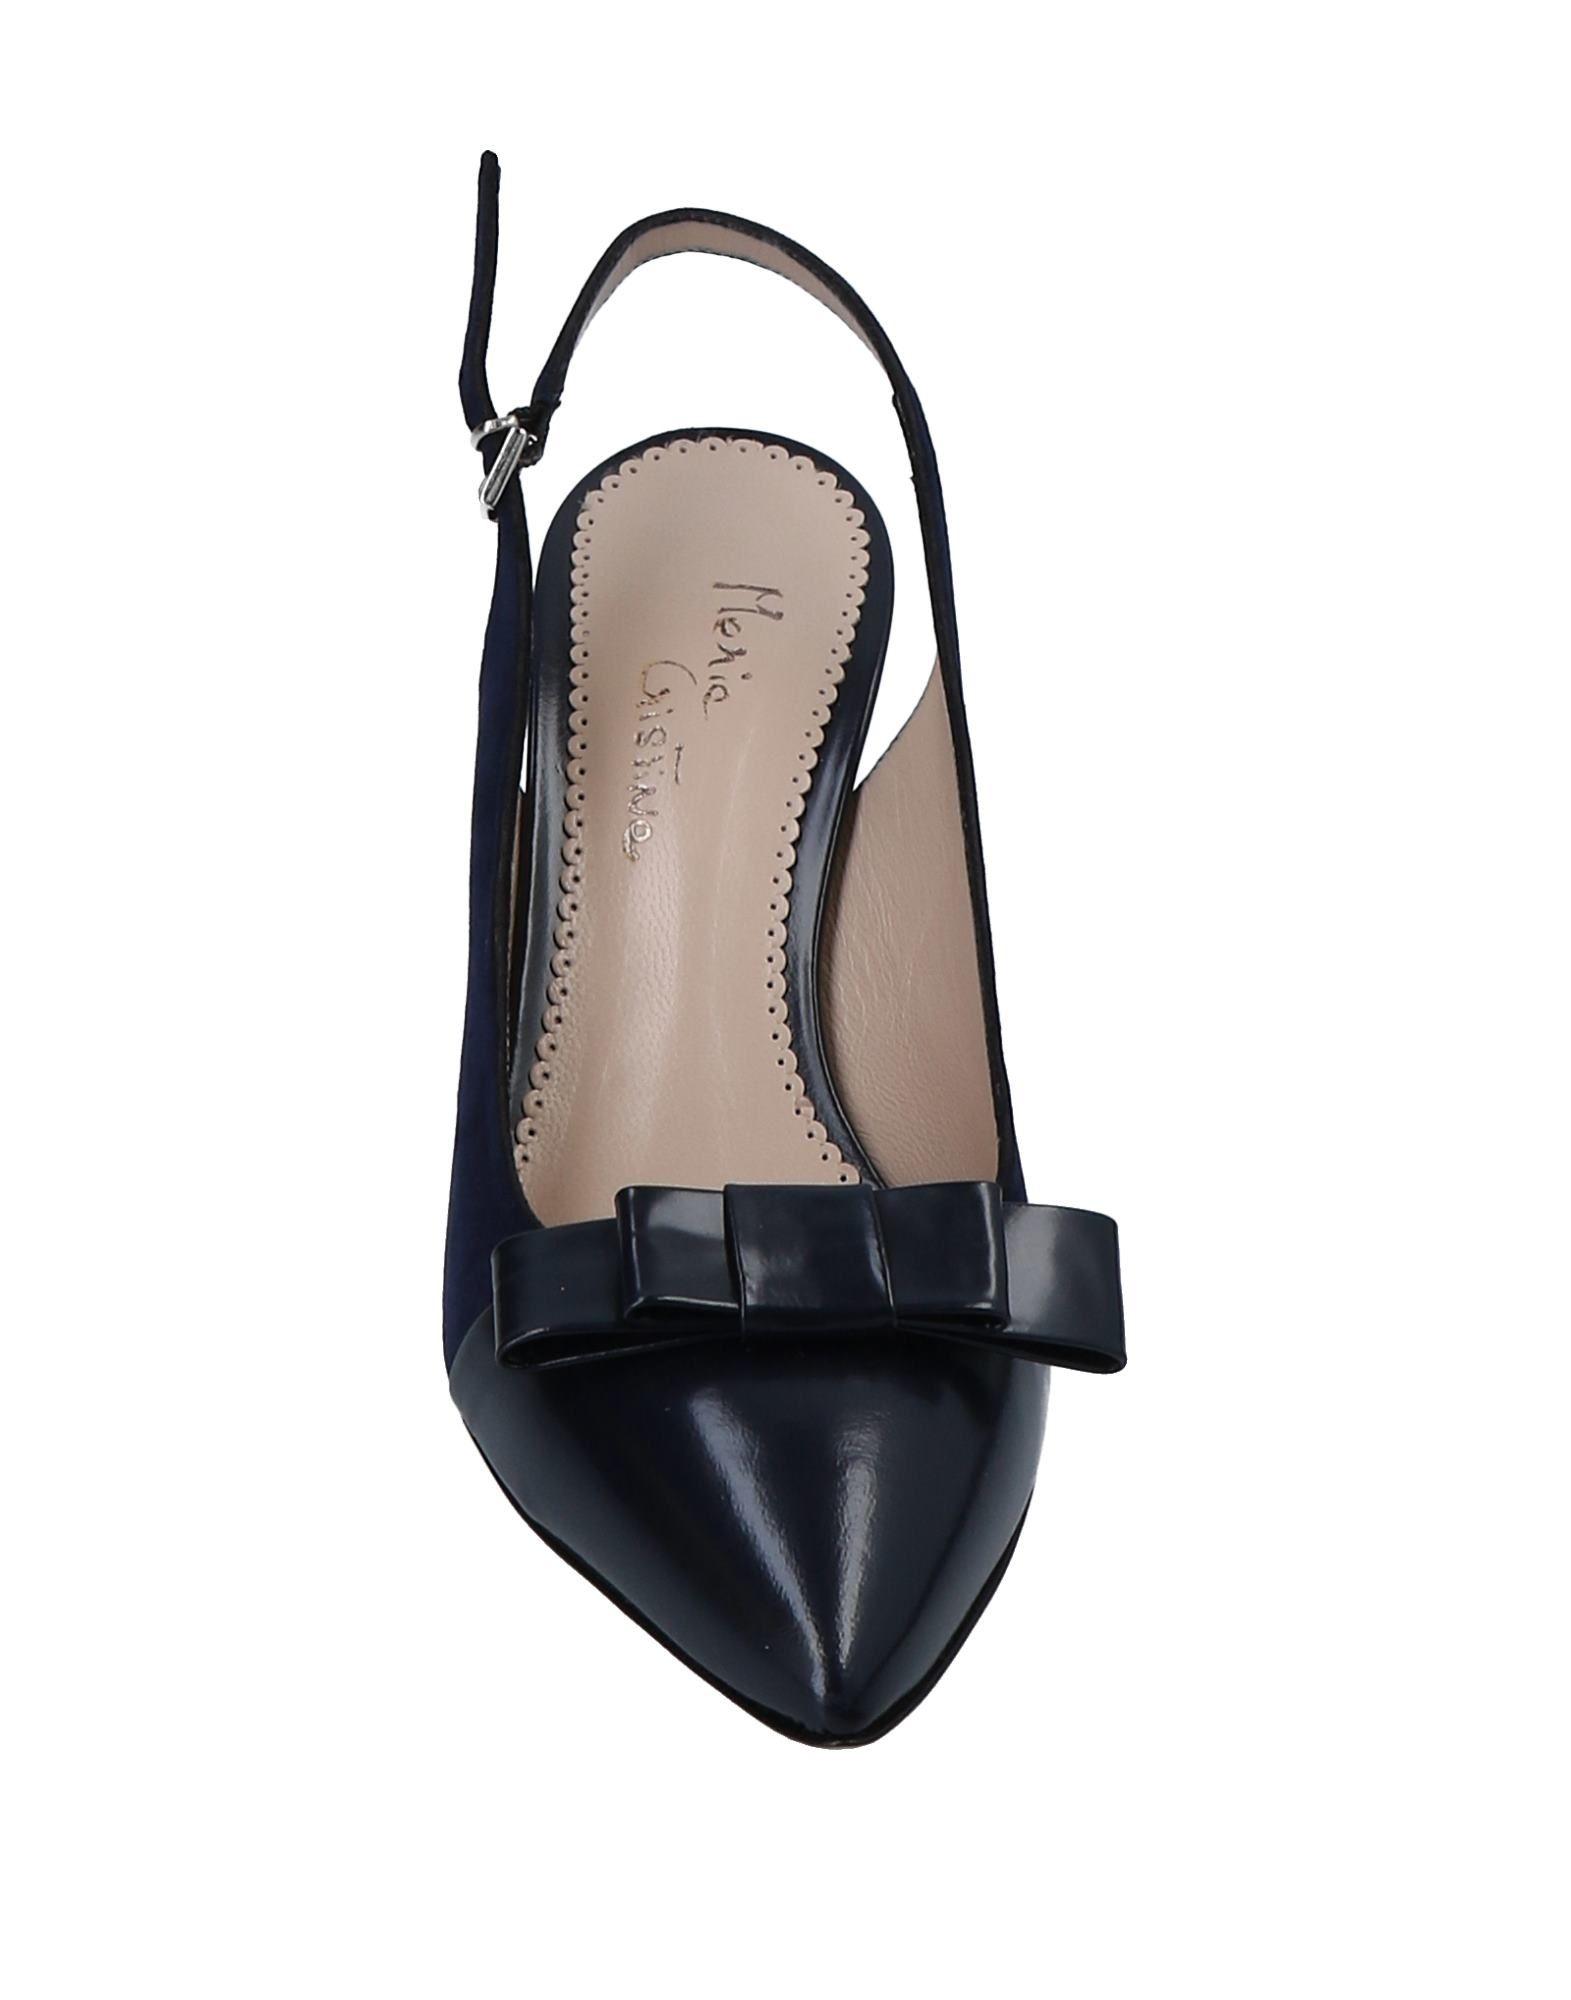 Stilvolle Cristina billige Schuhe Maria Cristina Stilvolle Pumps Damen  11549194MF 631f4d